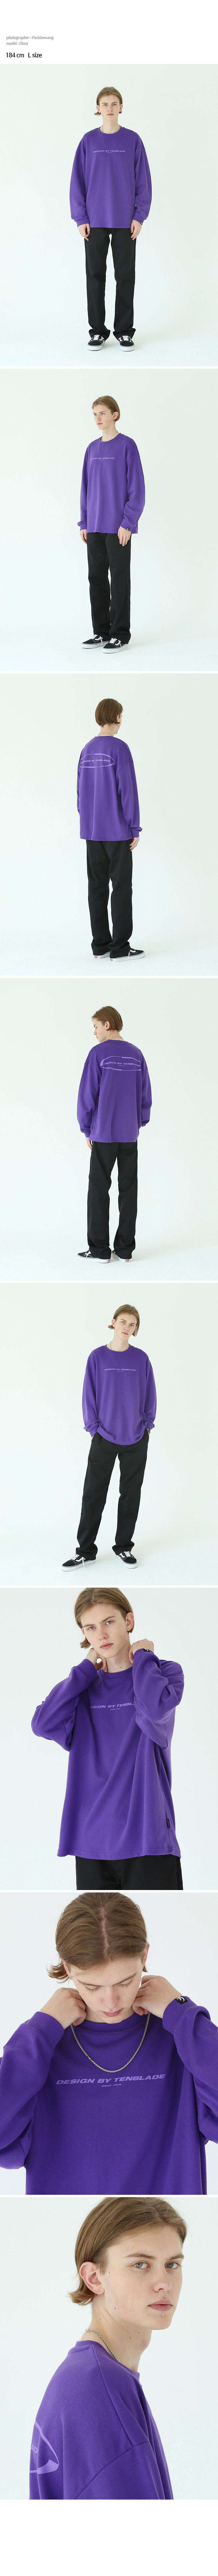 tai261ls-purple_02.jpg